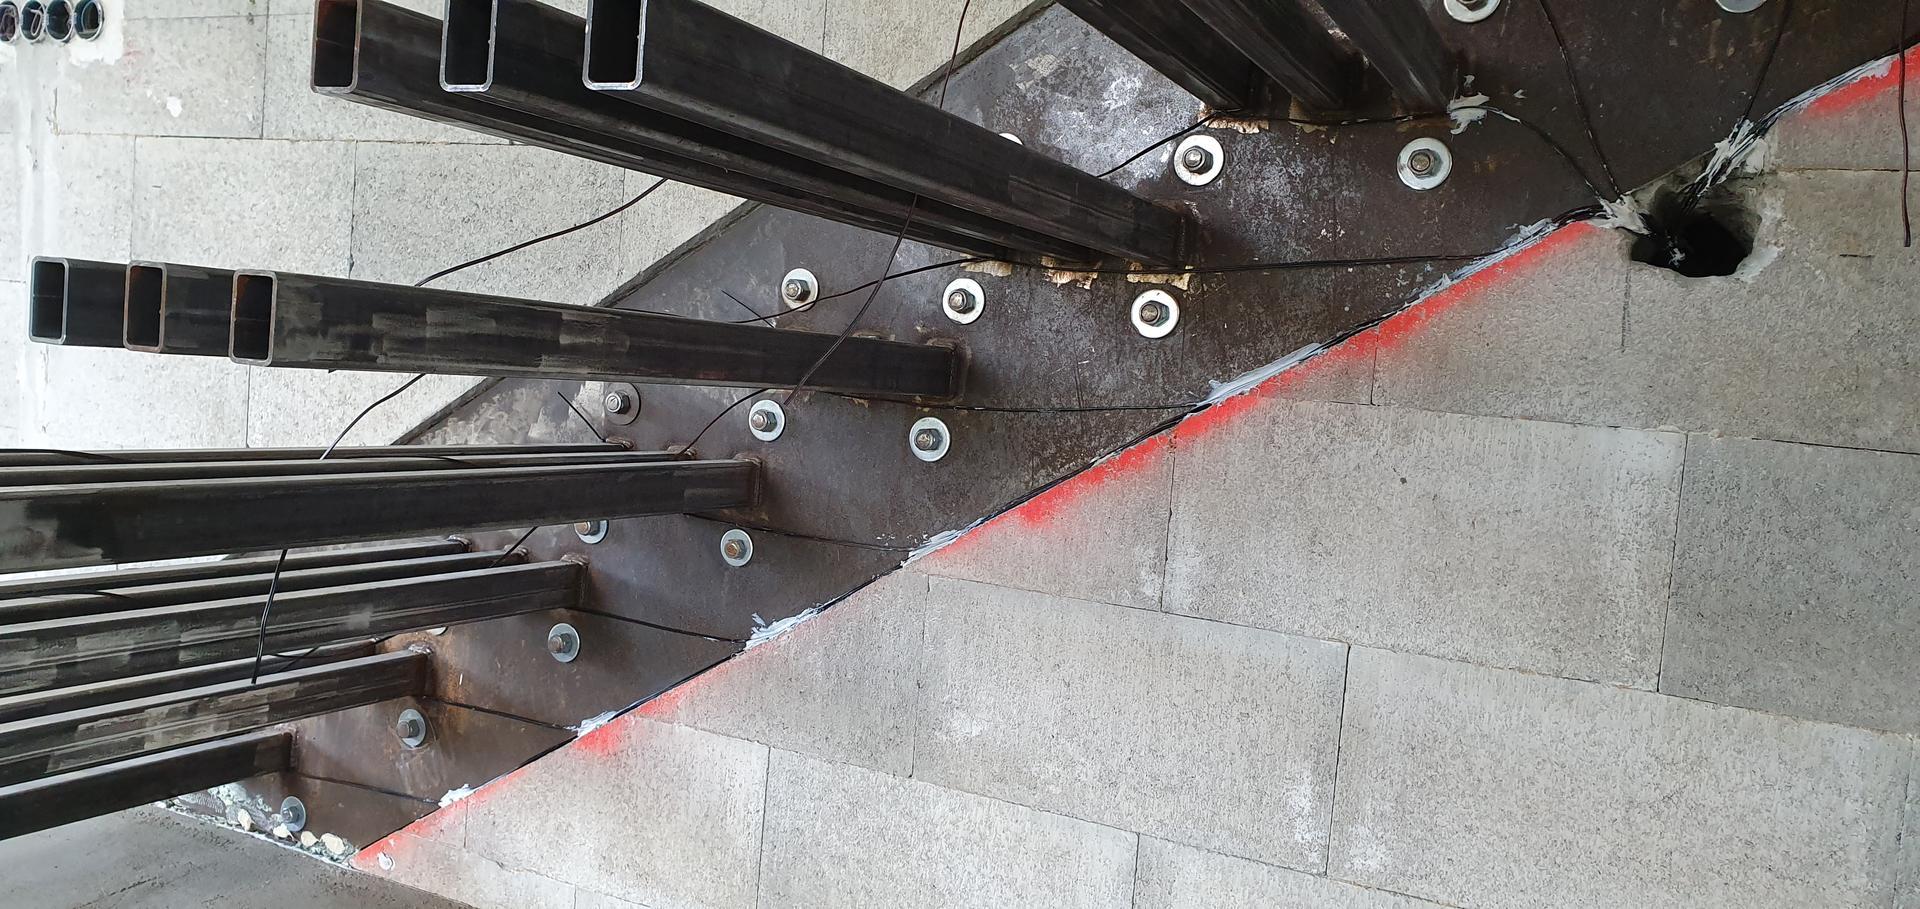 Konzolove schodisko (samonosne schody) - priprava na LED pasiky